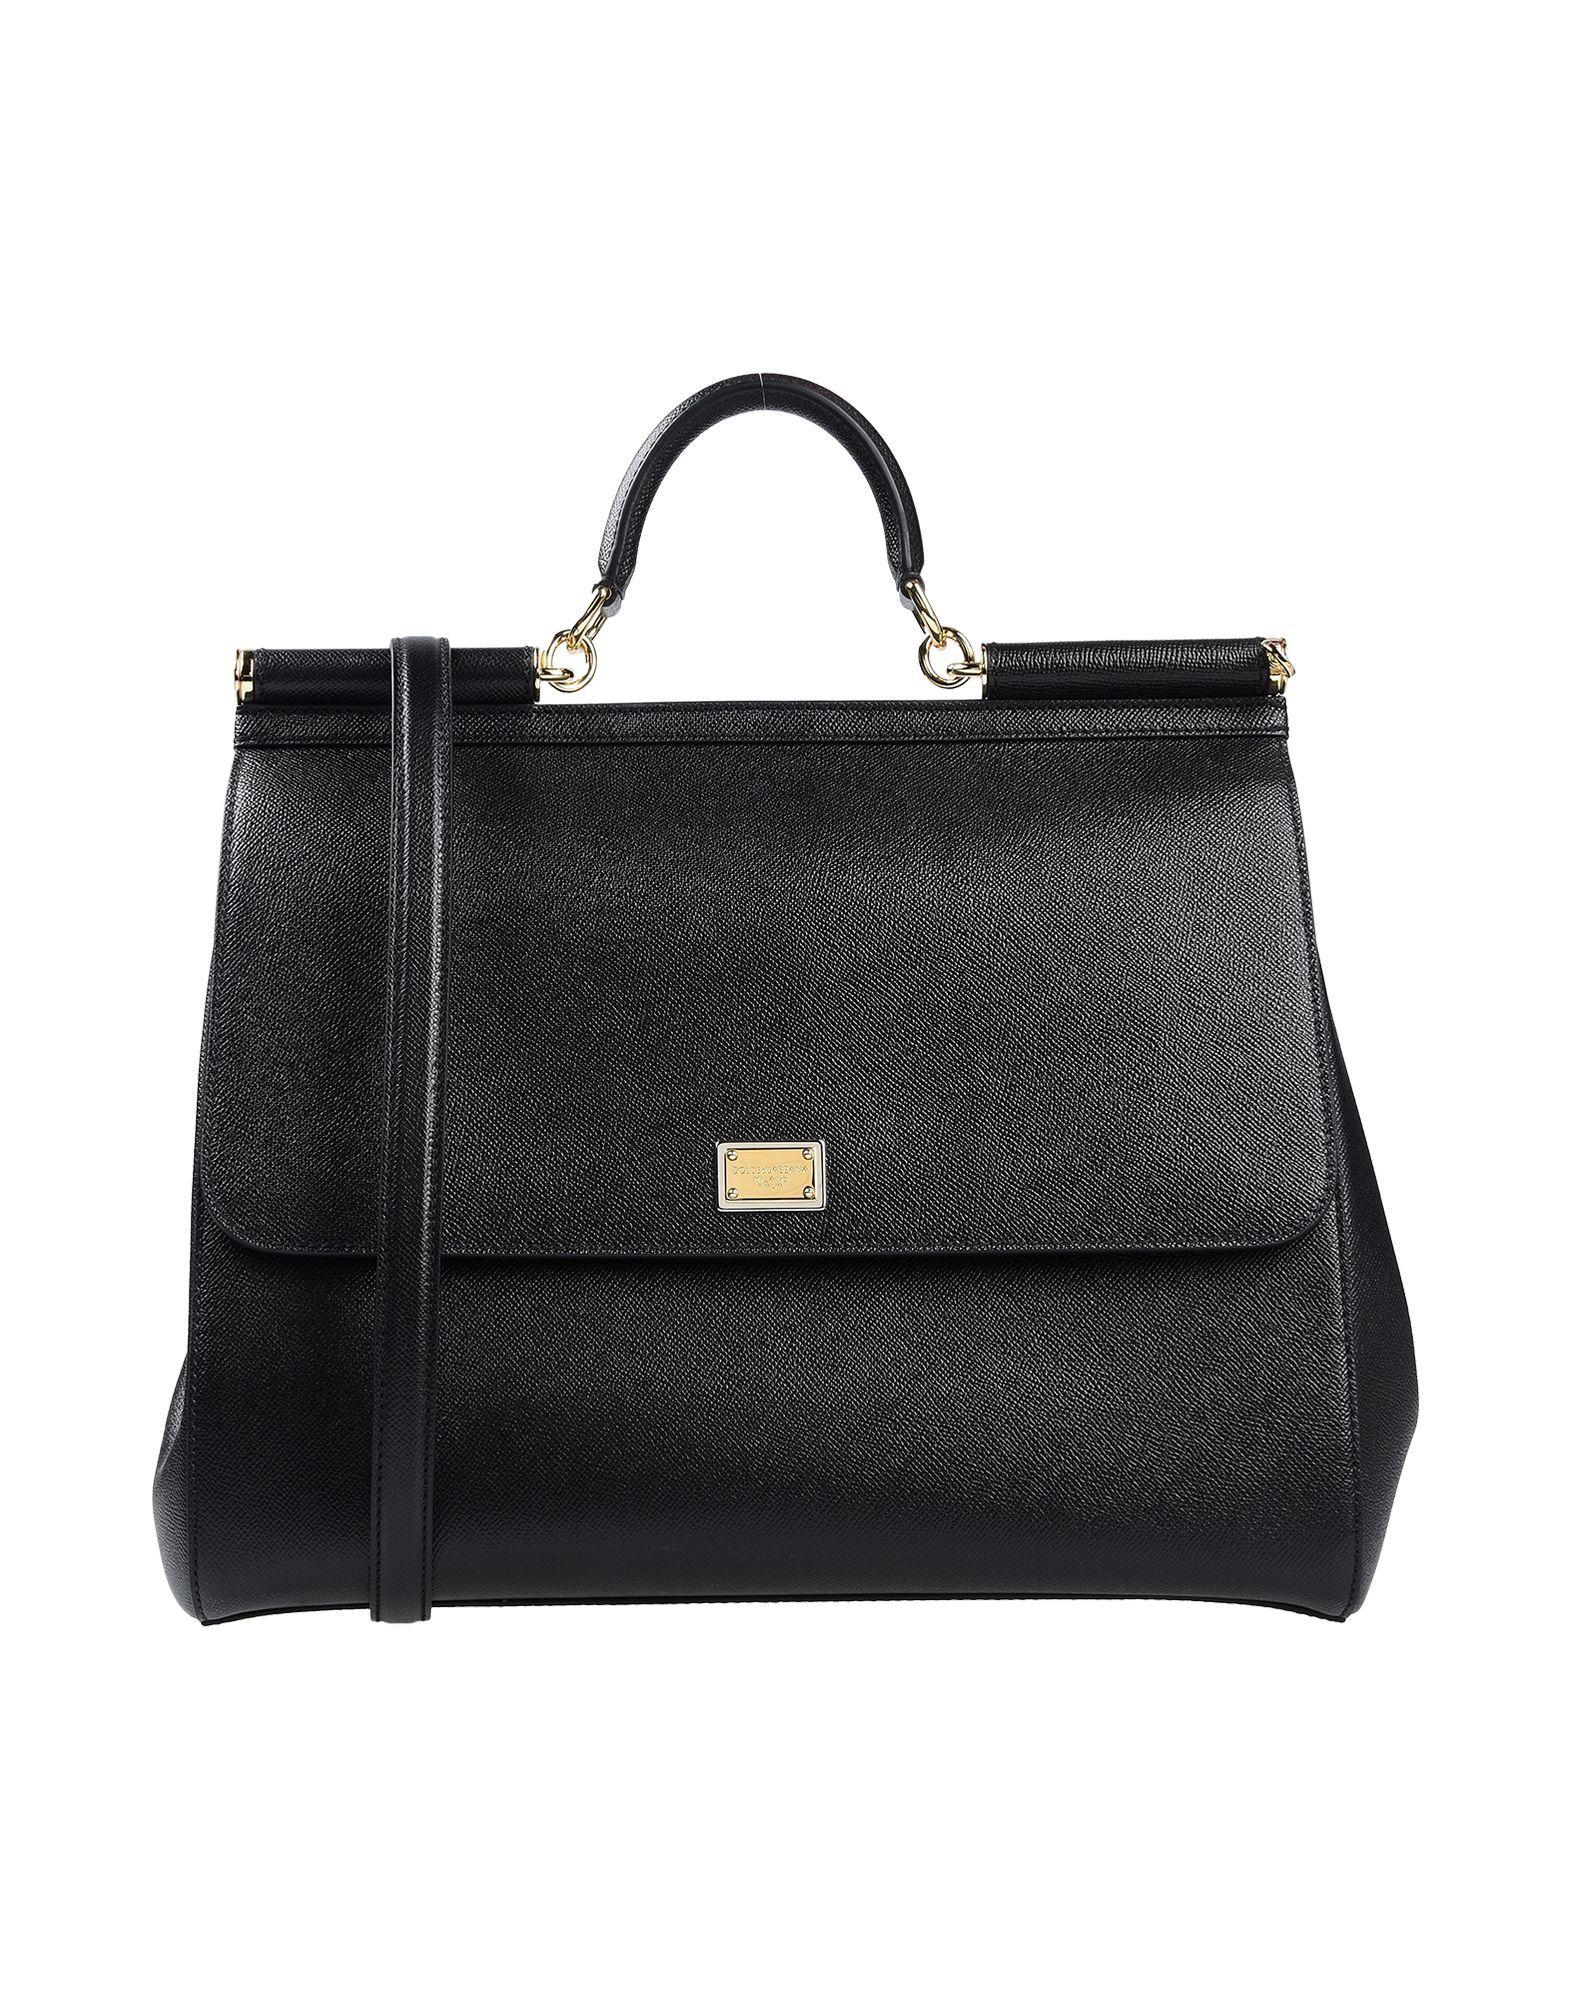 Dolce & Gabbana Black Calf Leather Top Handle Bag